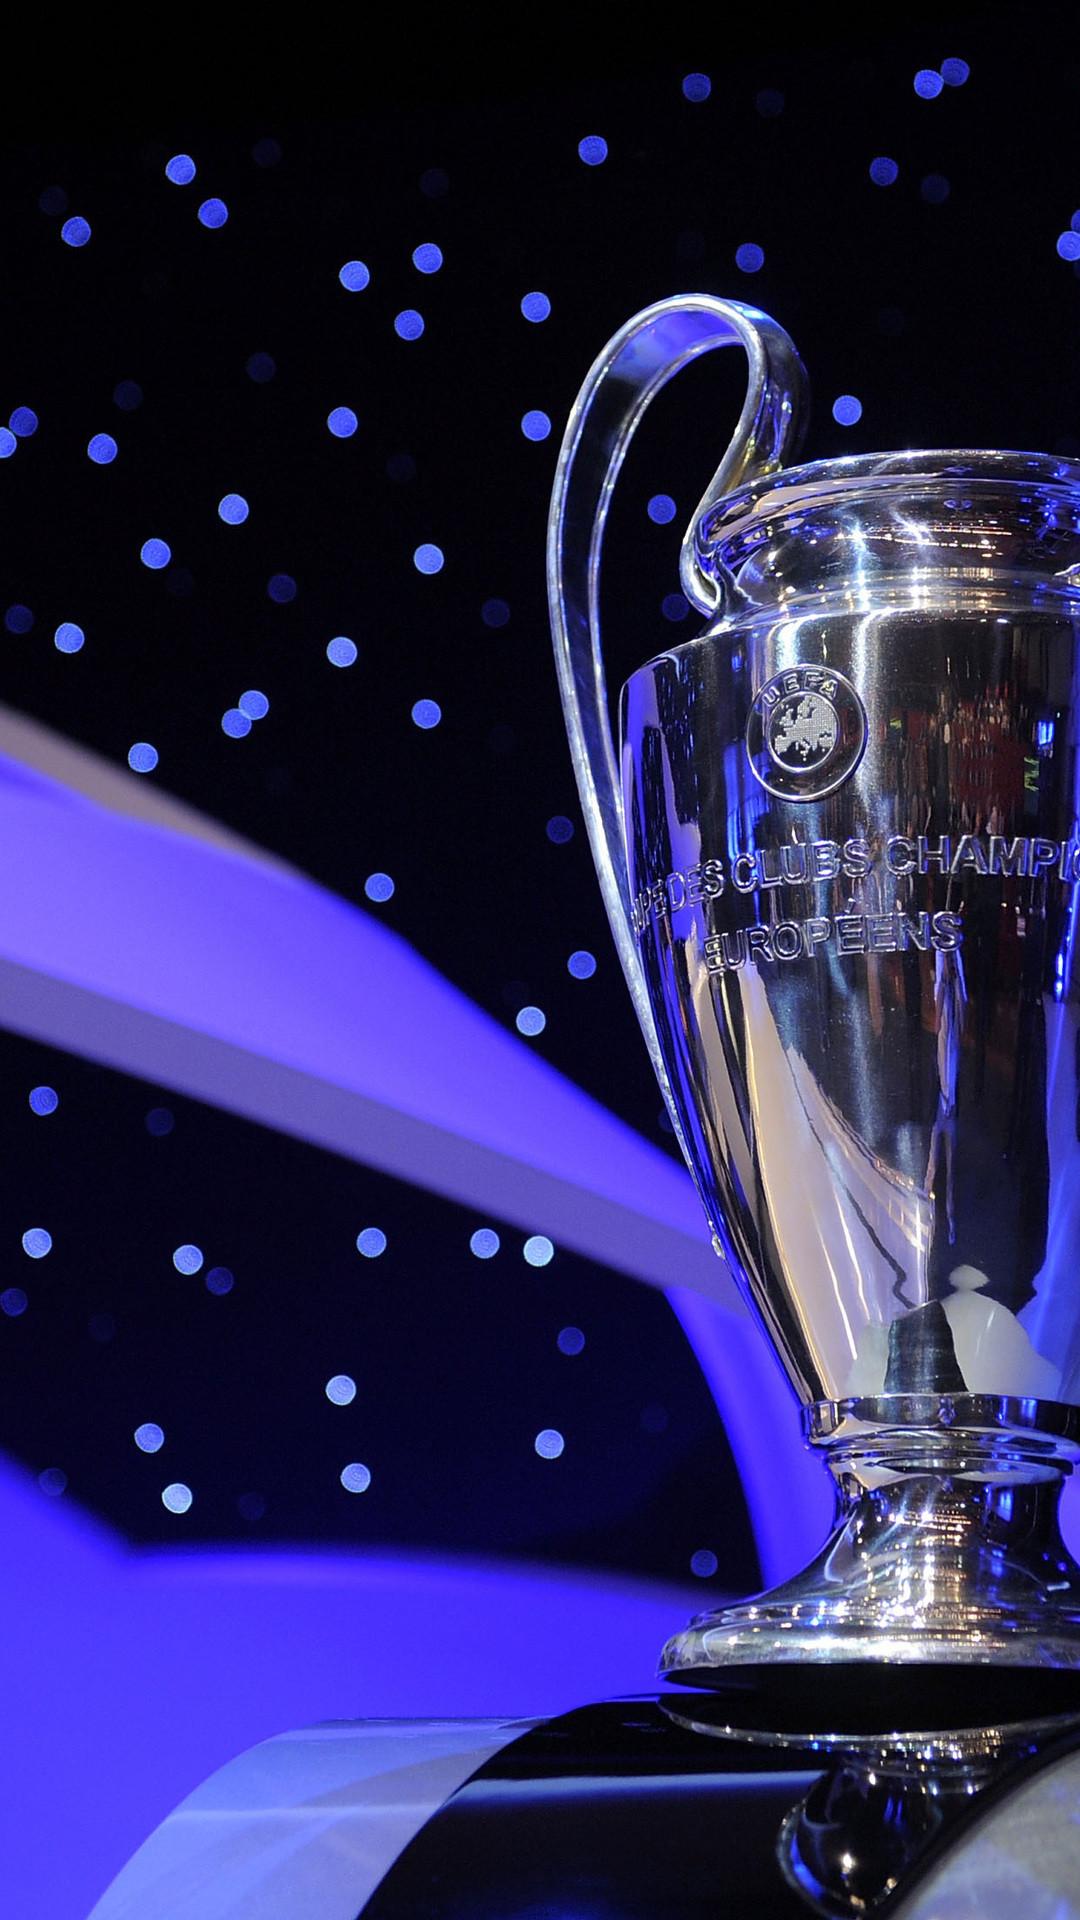 Res: 1080x1920, champions league cup, champions league, the champions cup, champions league  photo